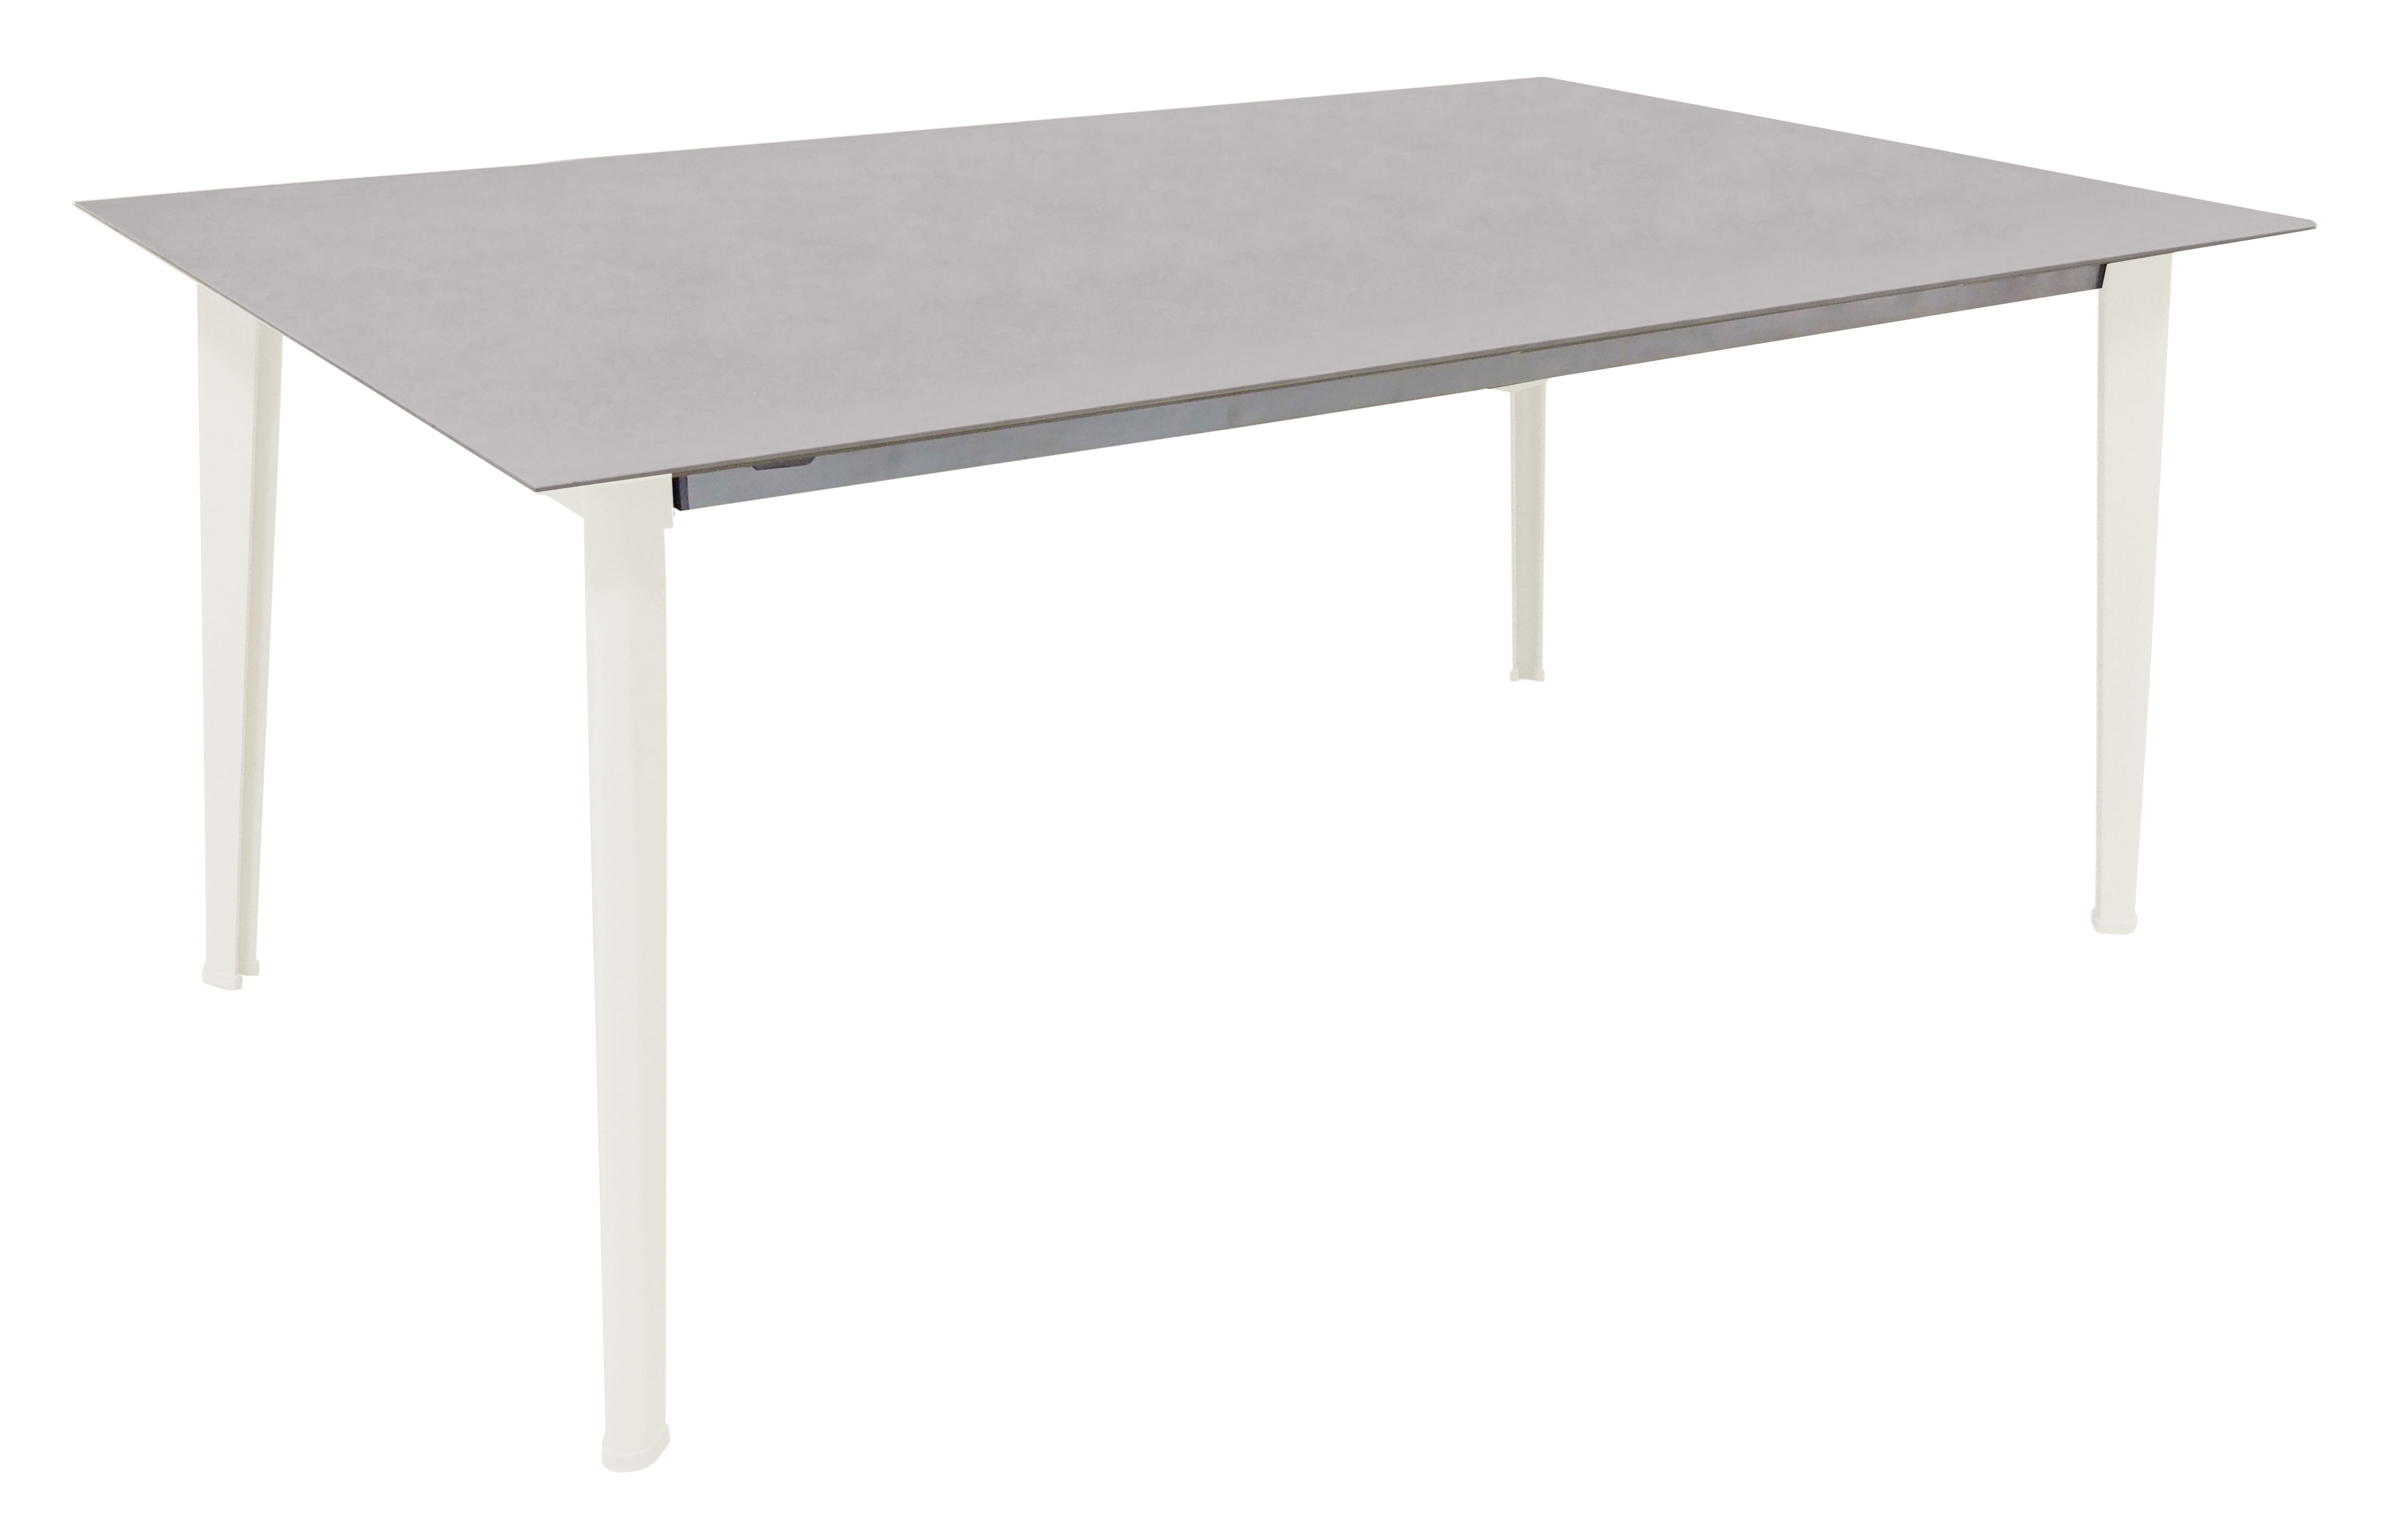 Jardin - Tables de jardin - Table Kira / Plateau grès émaillé - 100 x 180 cm - Emu - Blanc - Aluminium, Grès